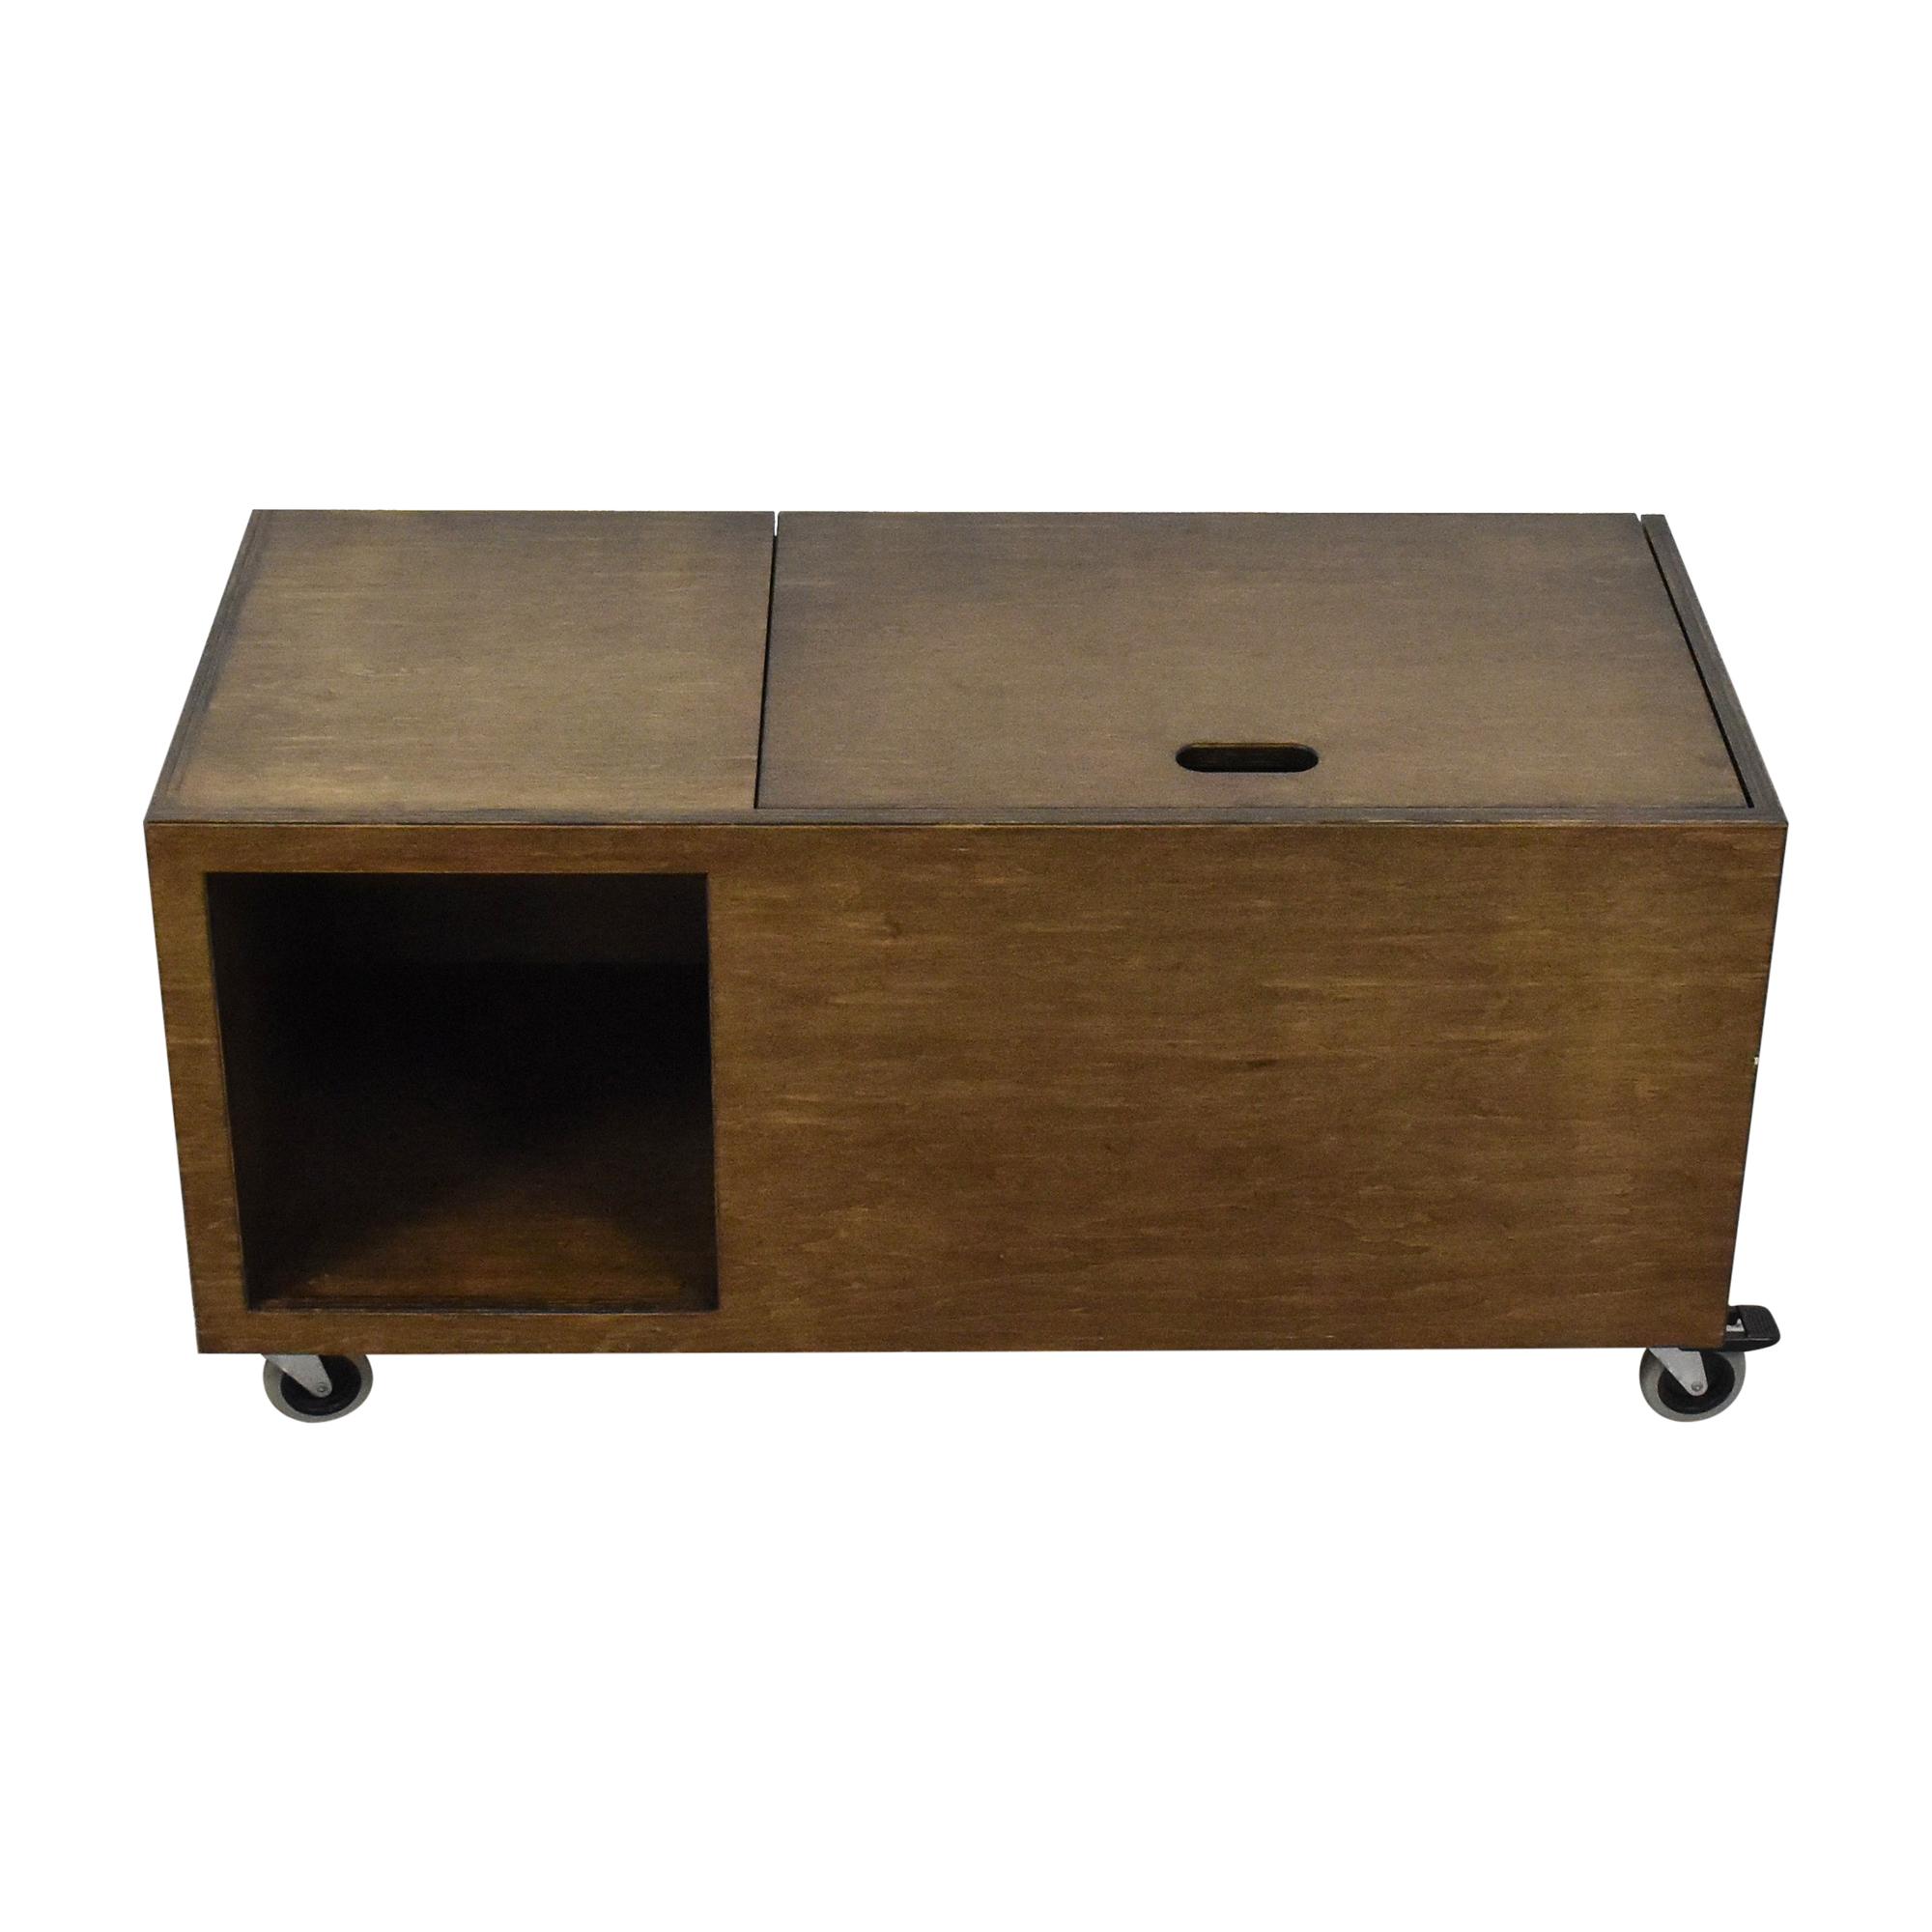 Custom Storage Unit on Casters